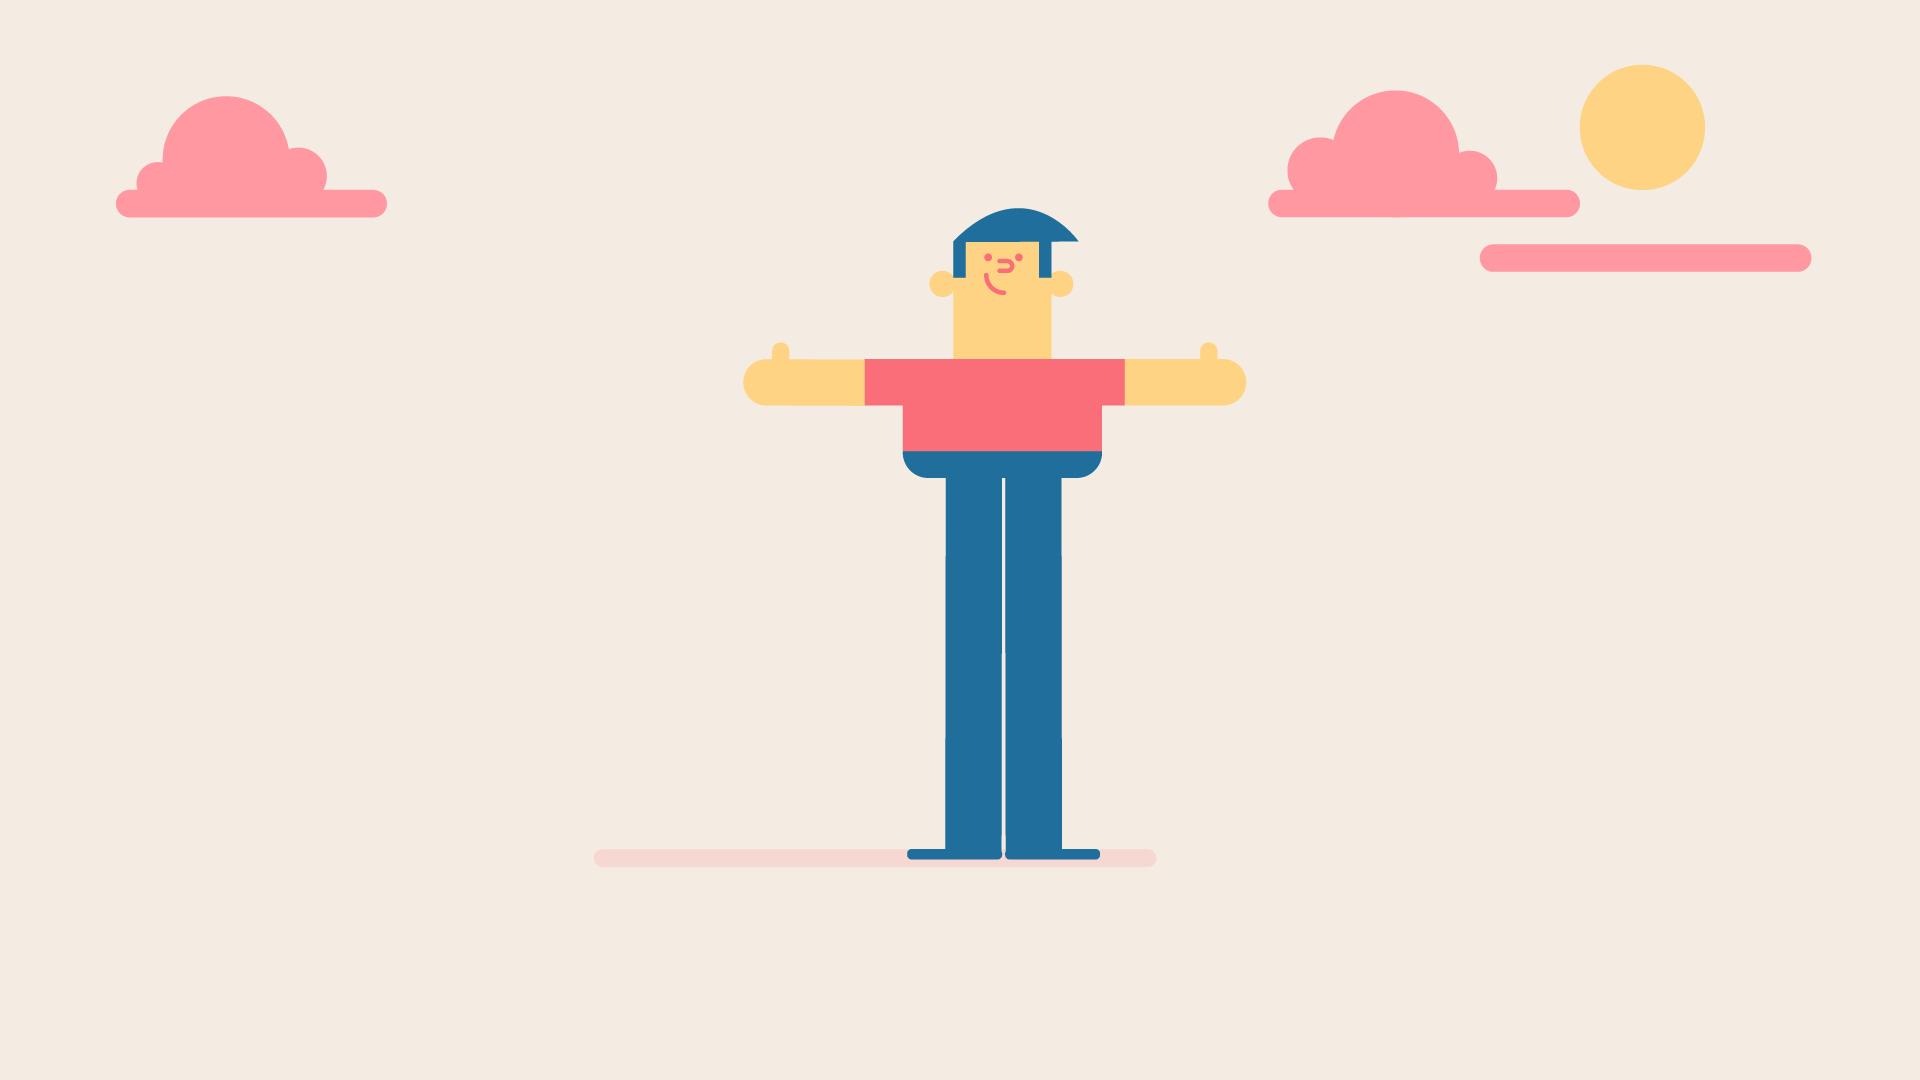 Health Insurance character design